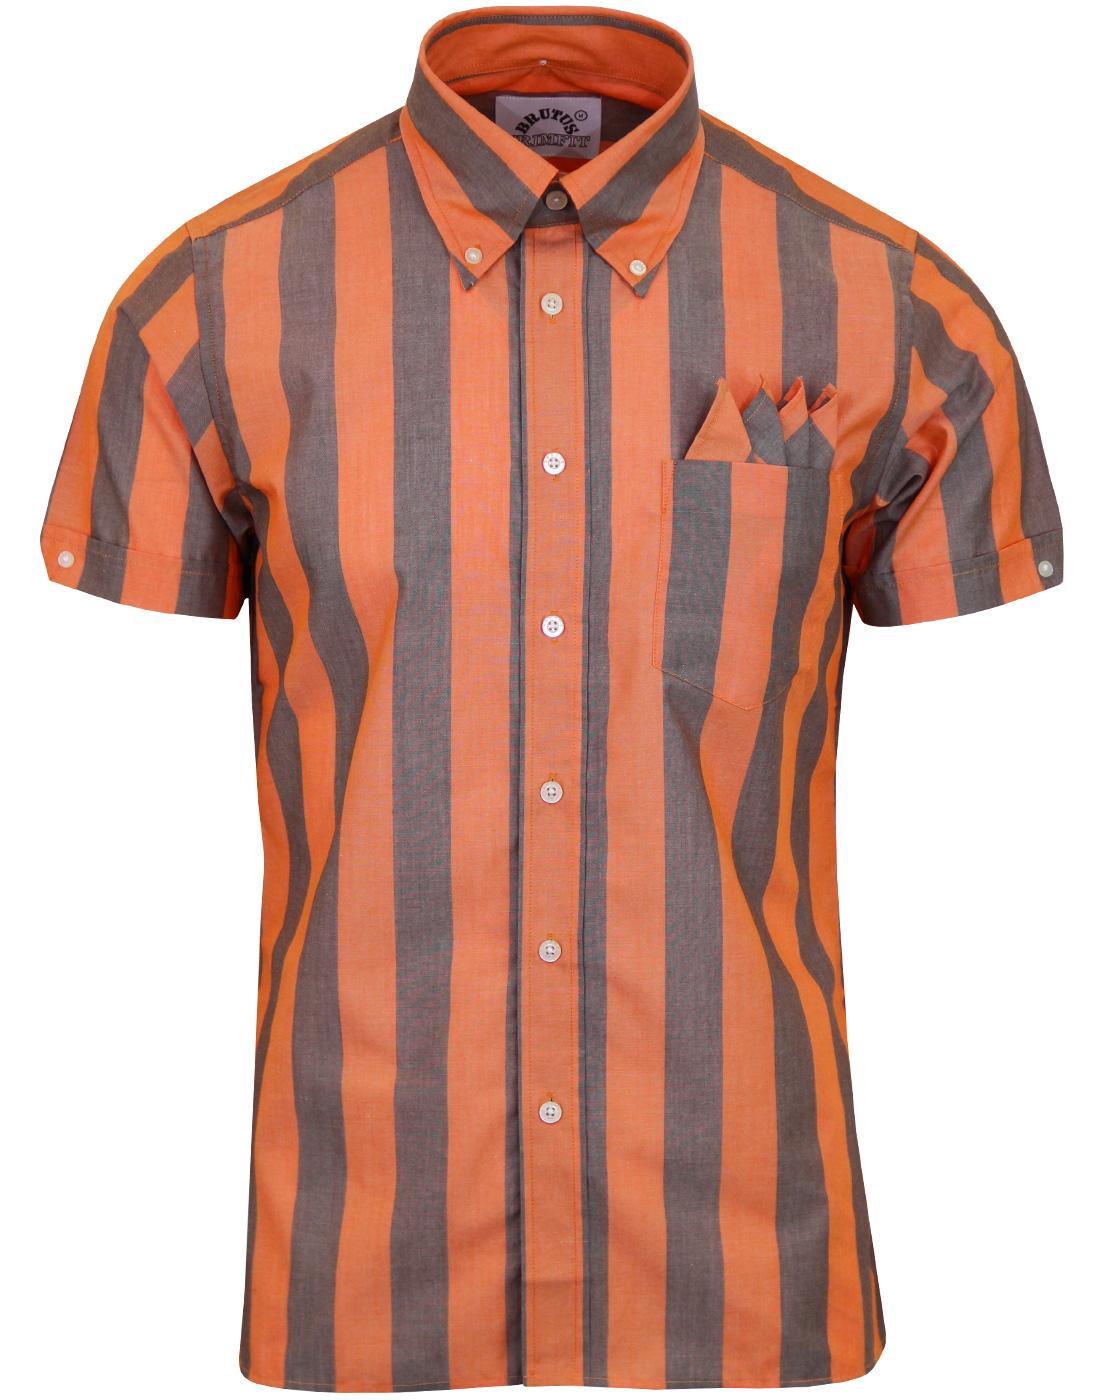 1730c61f6e9711 BRUTUS TRIMFIT Retro Mod Roller Stripe Shirt Orange Cocoa